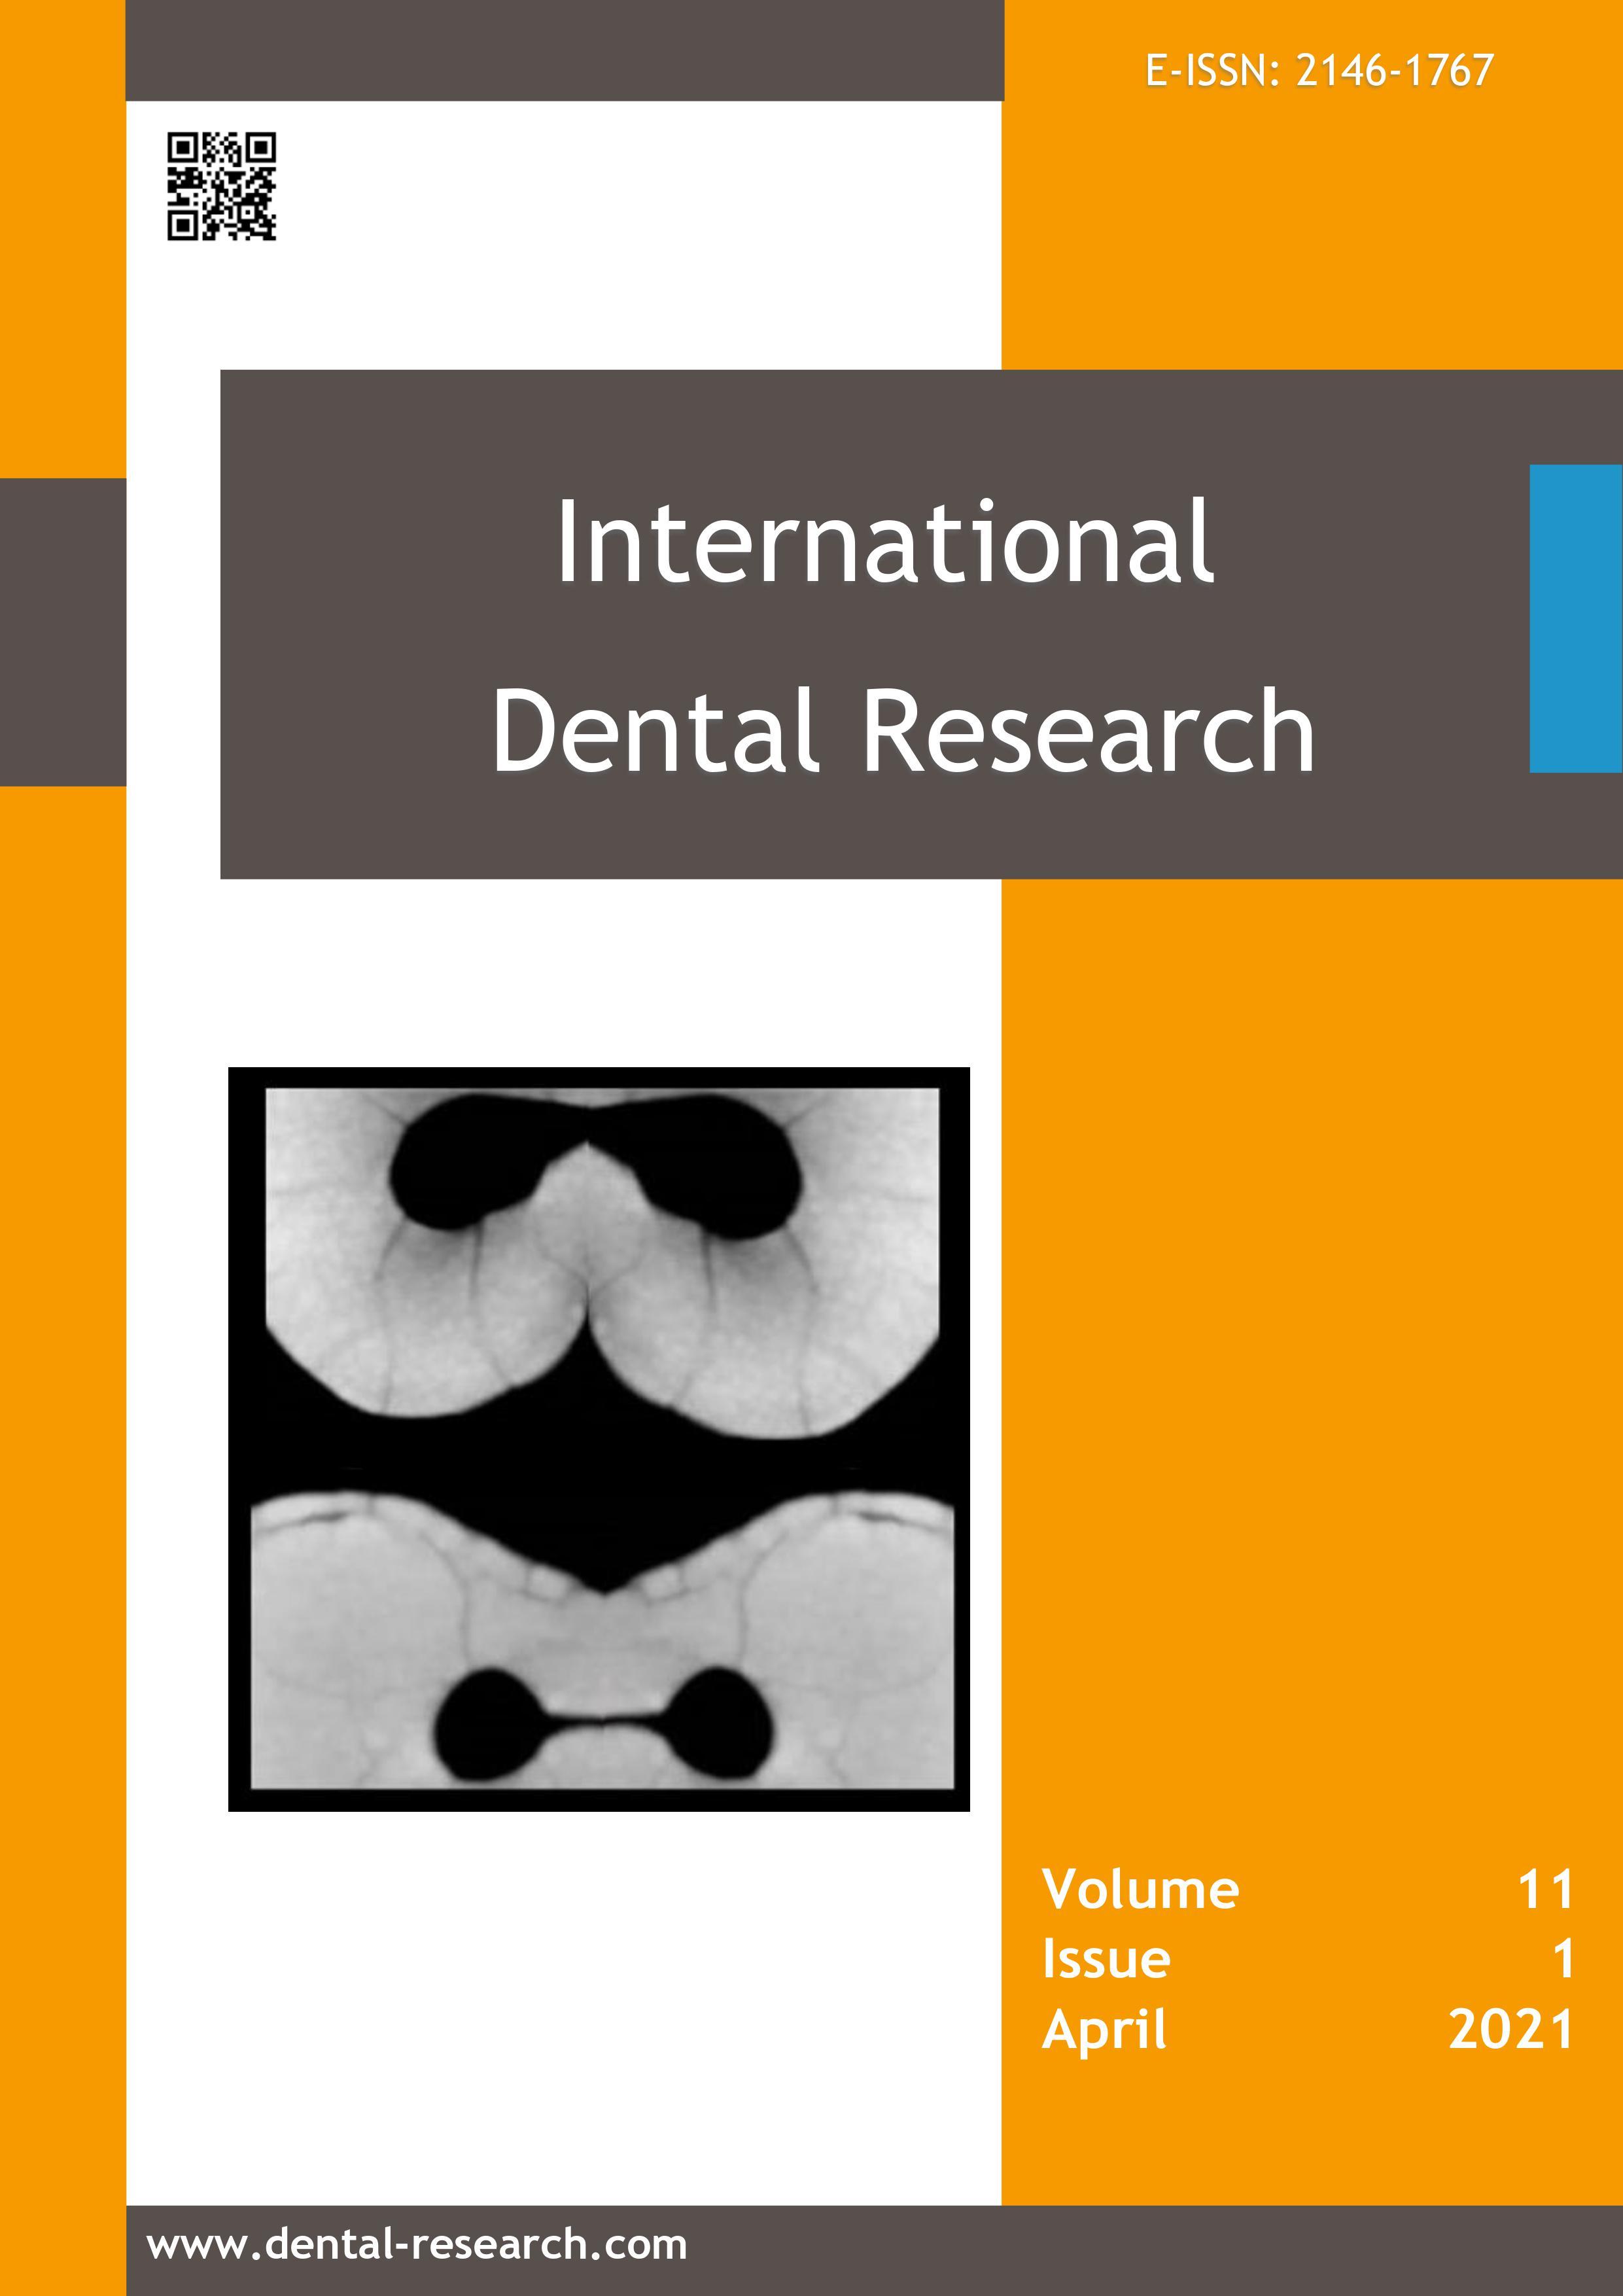 Vol 11 No 1 (2021): International Dental Research